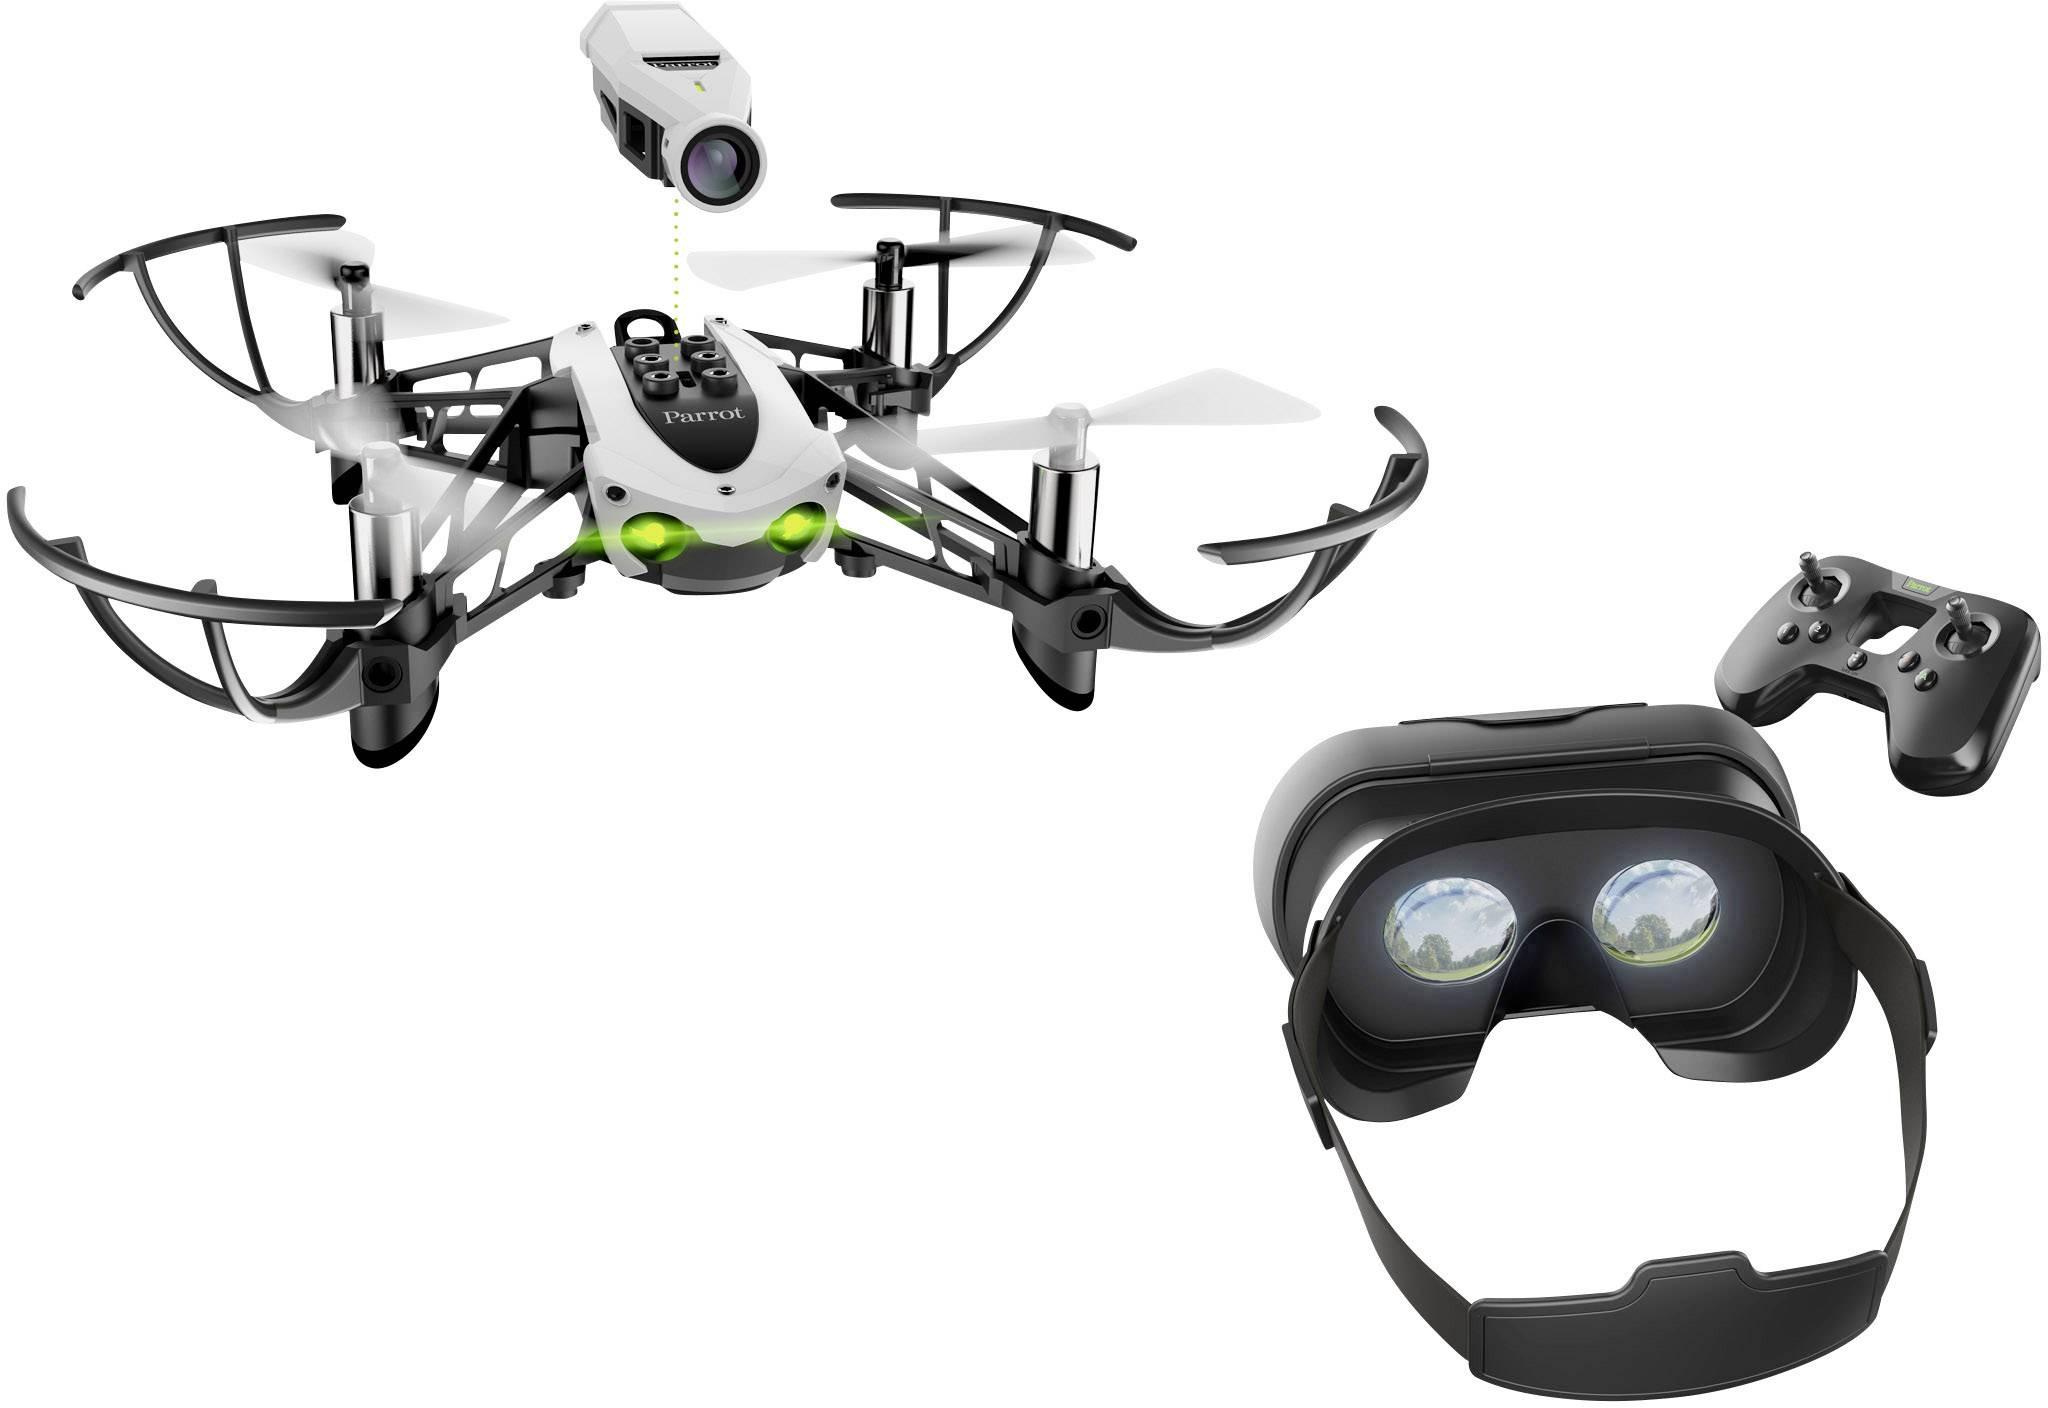 Dron Parrot Mambo FPV, RtF s HD kamerou a VR brýlemi